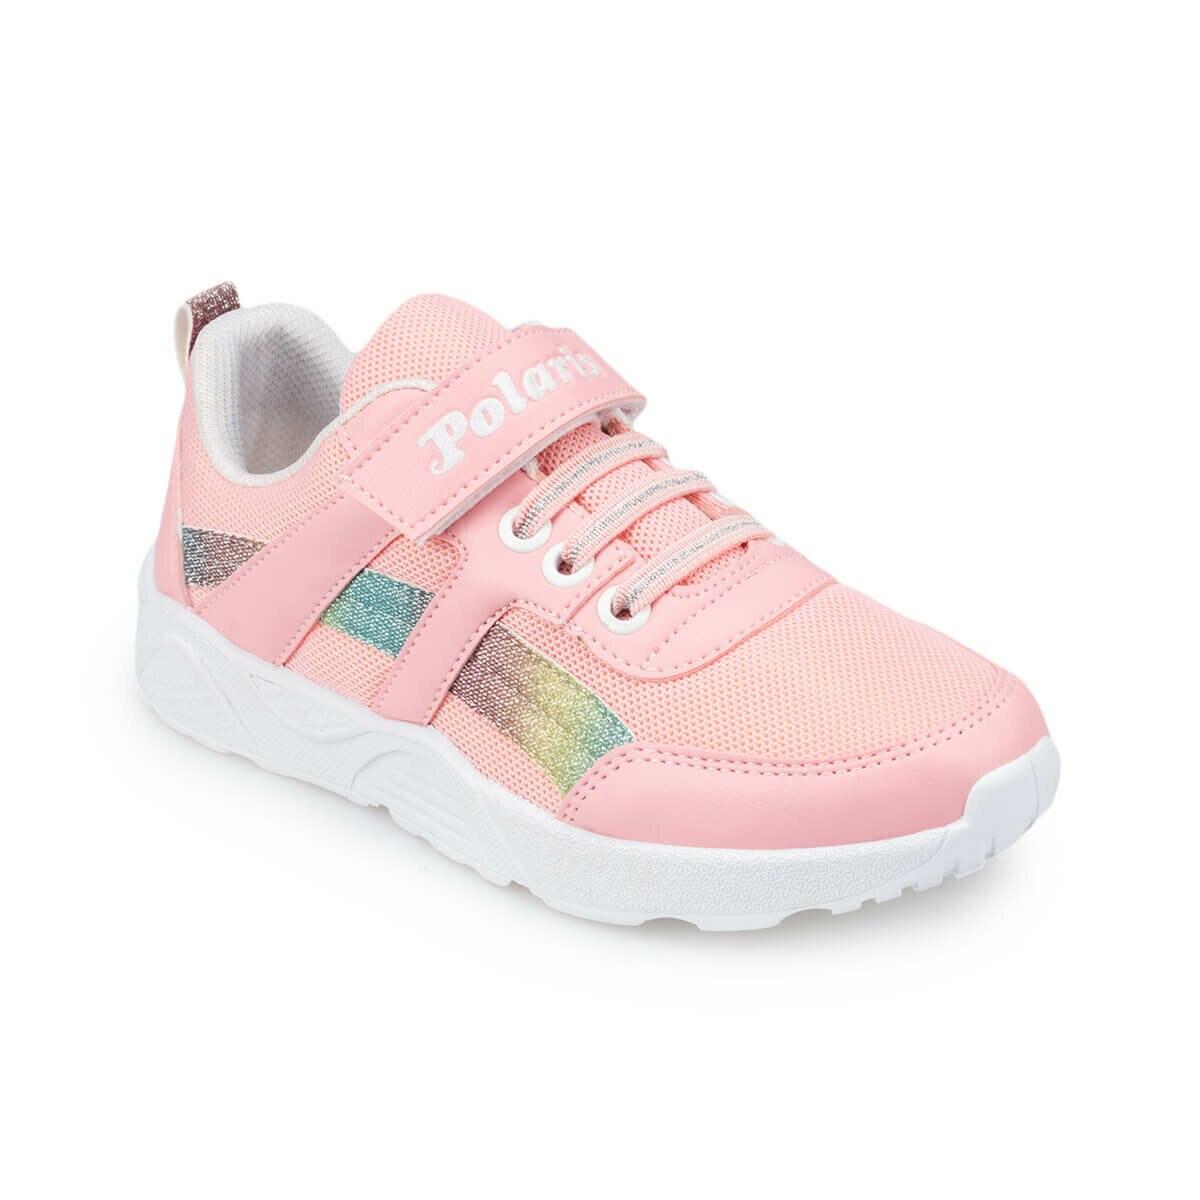 FLO 91.511300.F Pink Female Child Sports Shoes Polaris